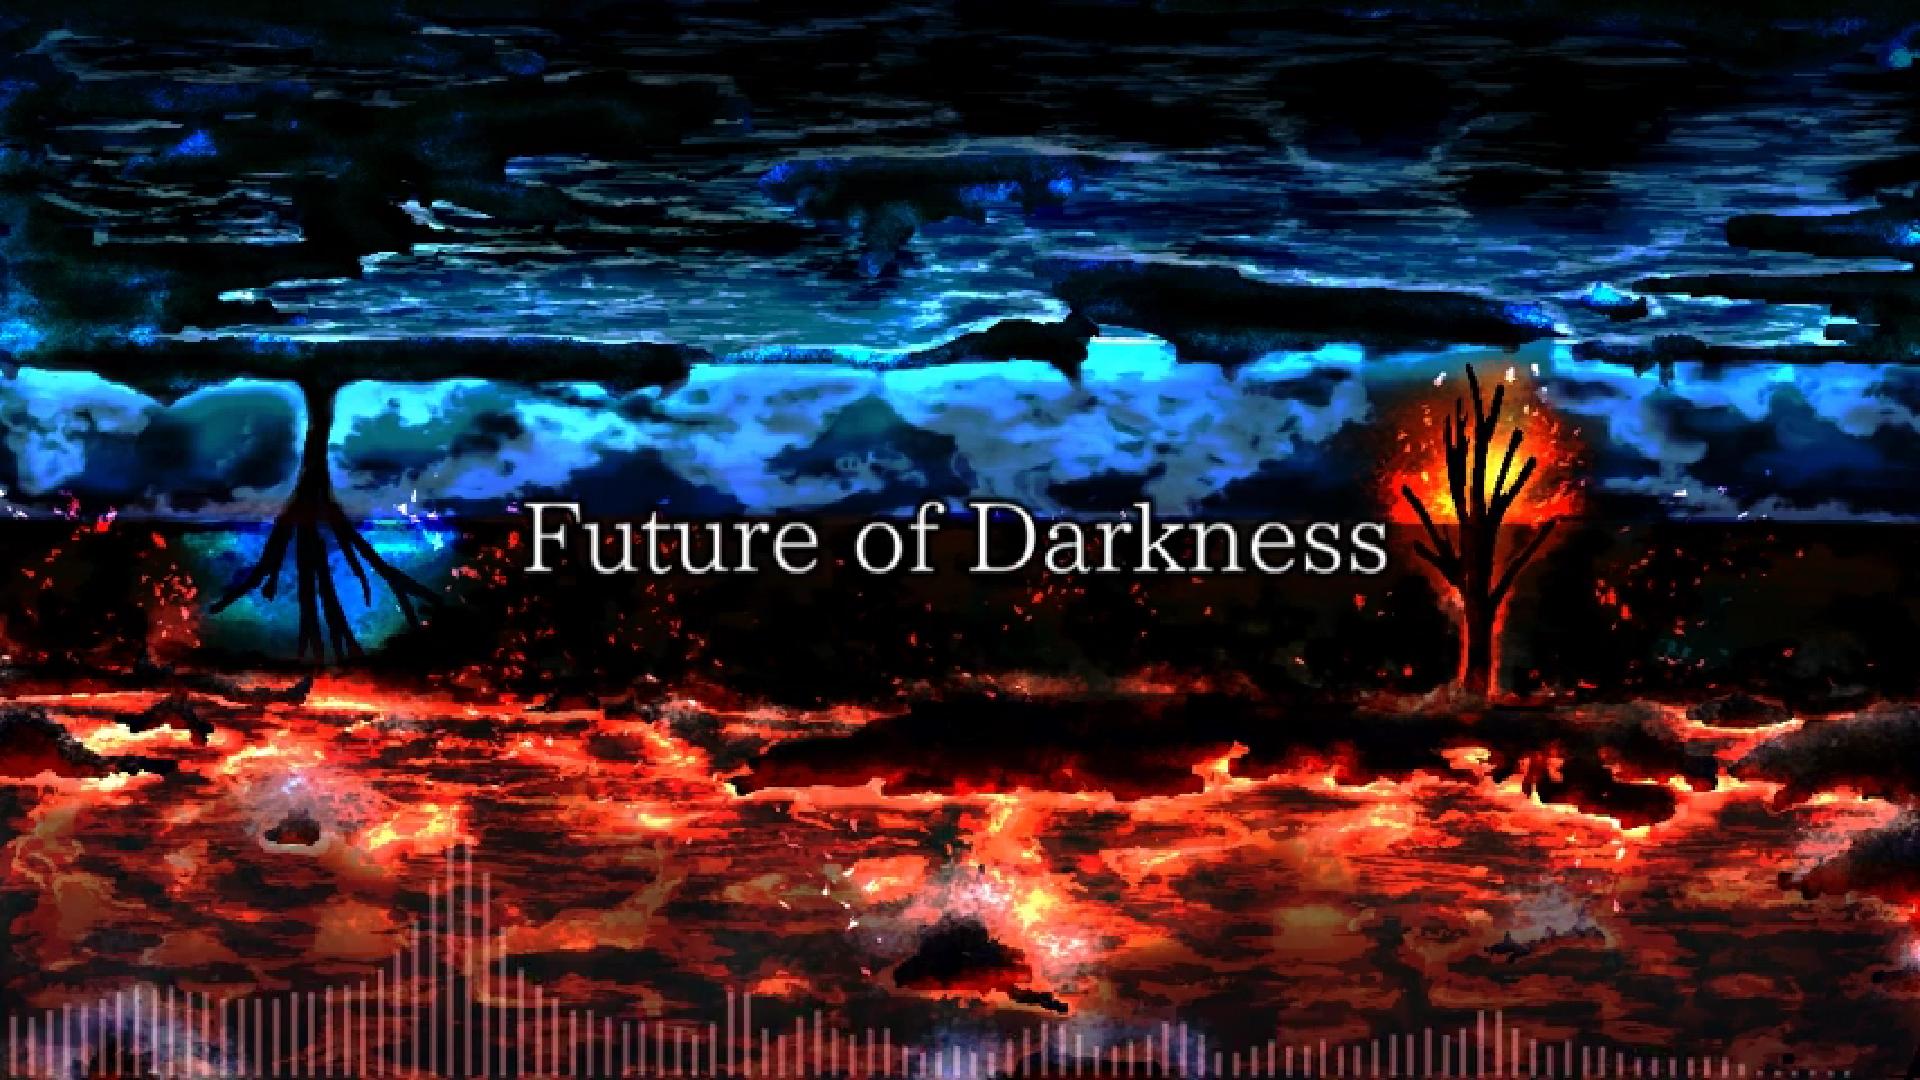 Future of Darkness